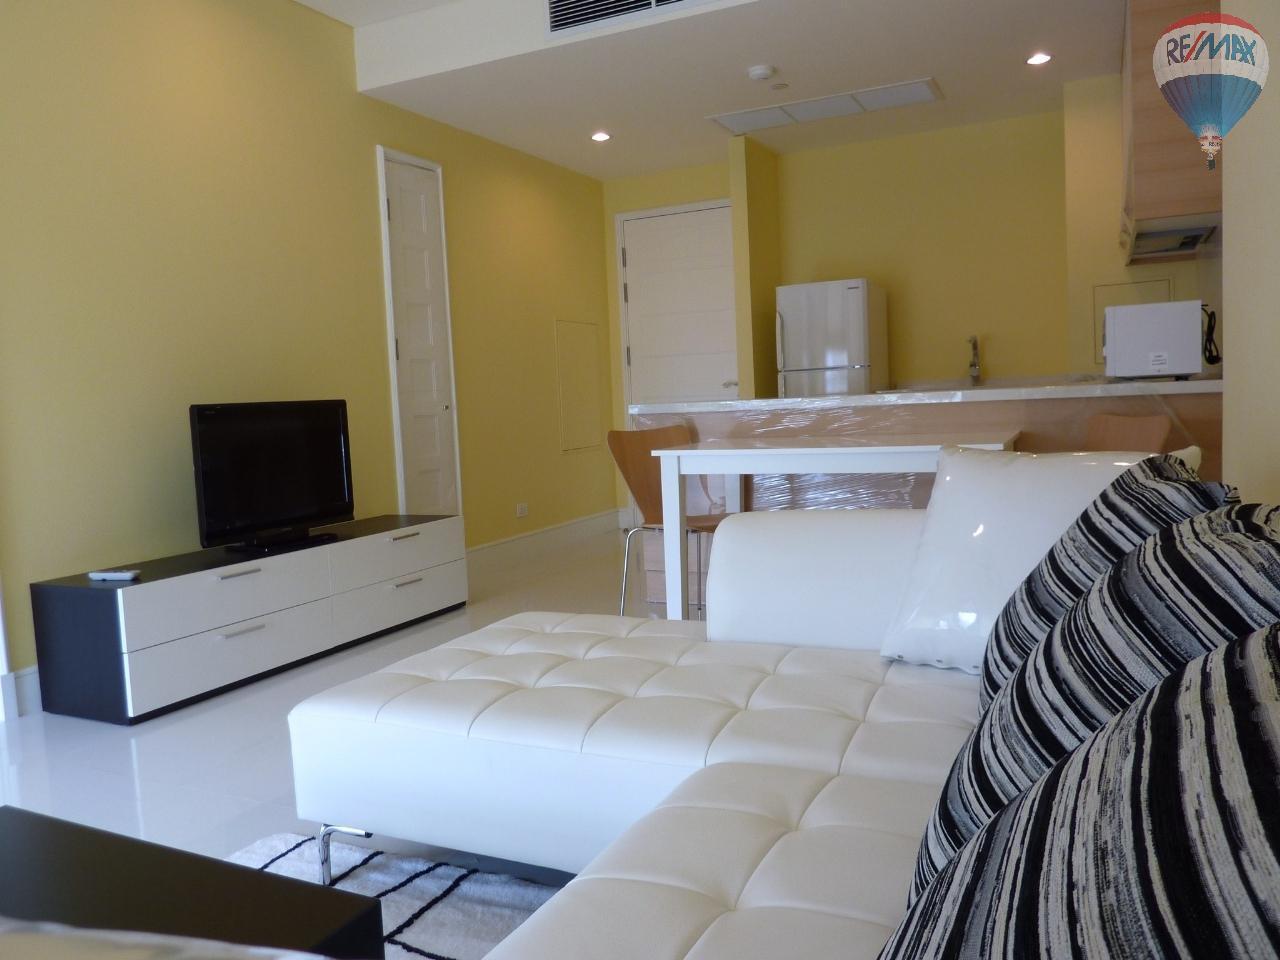 RE/MAX Properties Agency's Aguston 22, BTS Phrom Phong, 1B/1B, pet-friendly condo 1